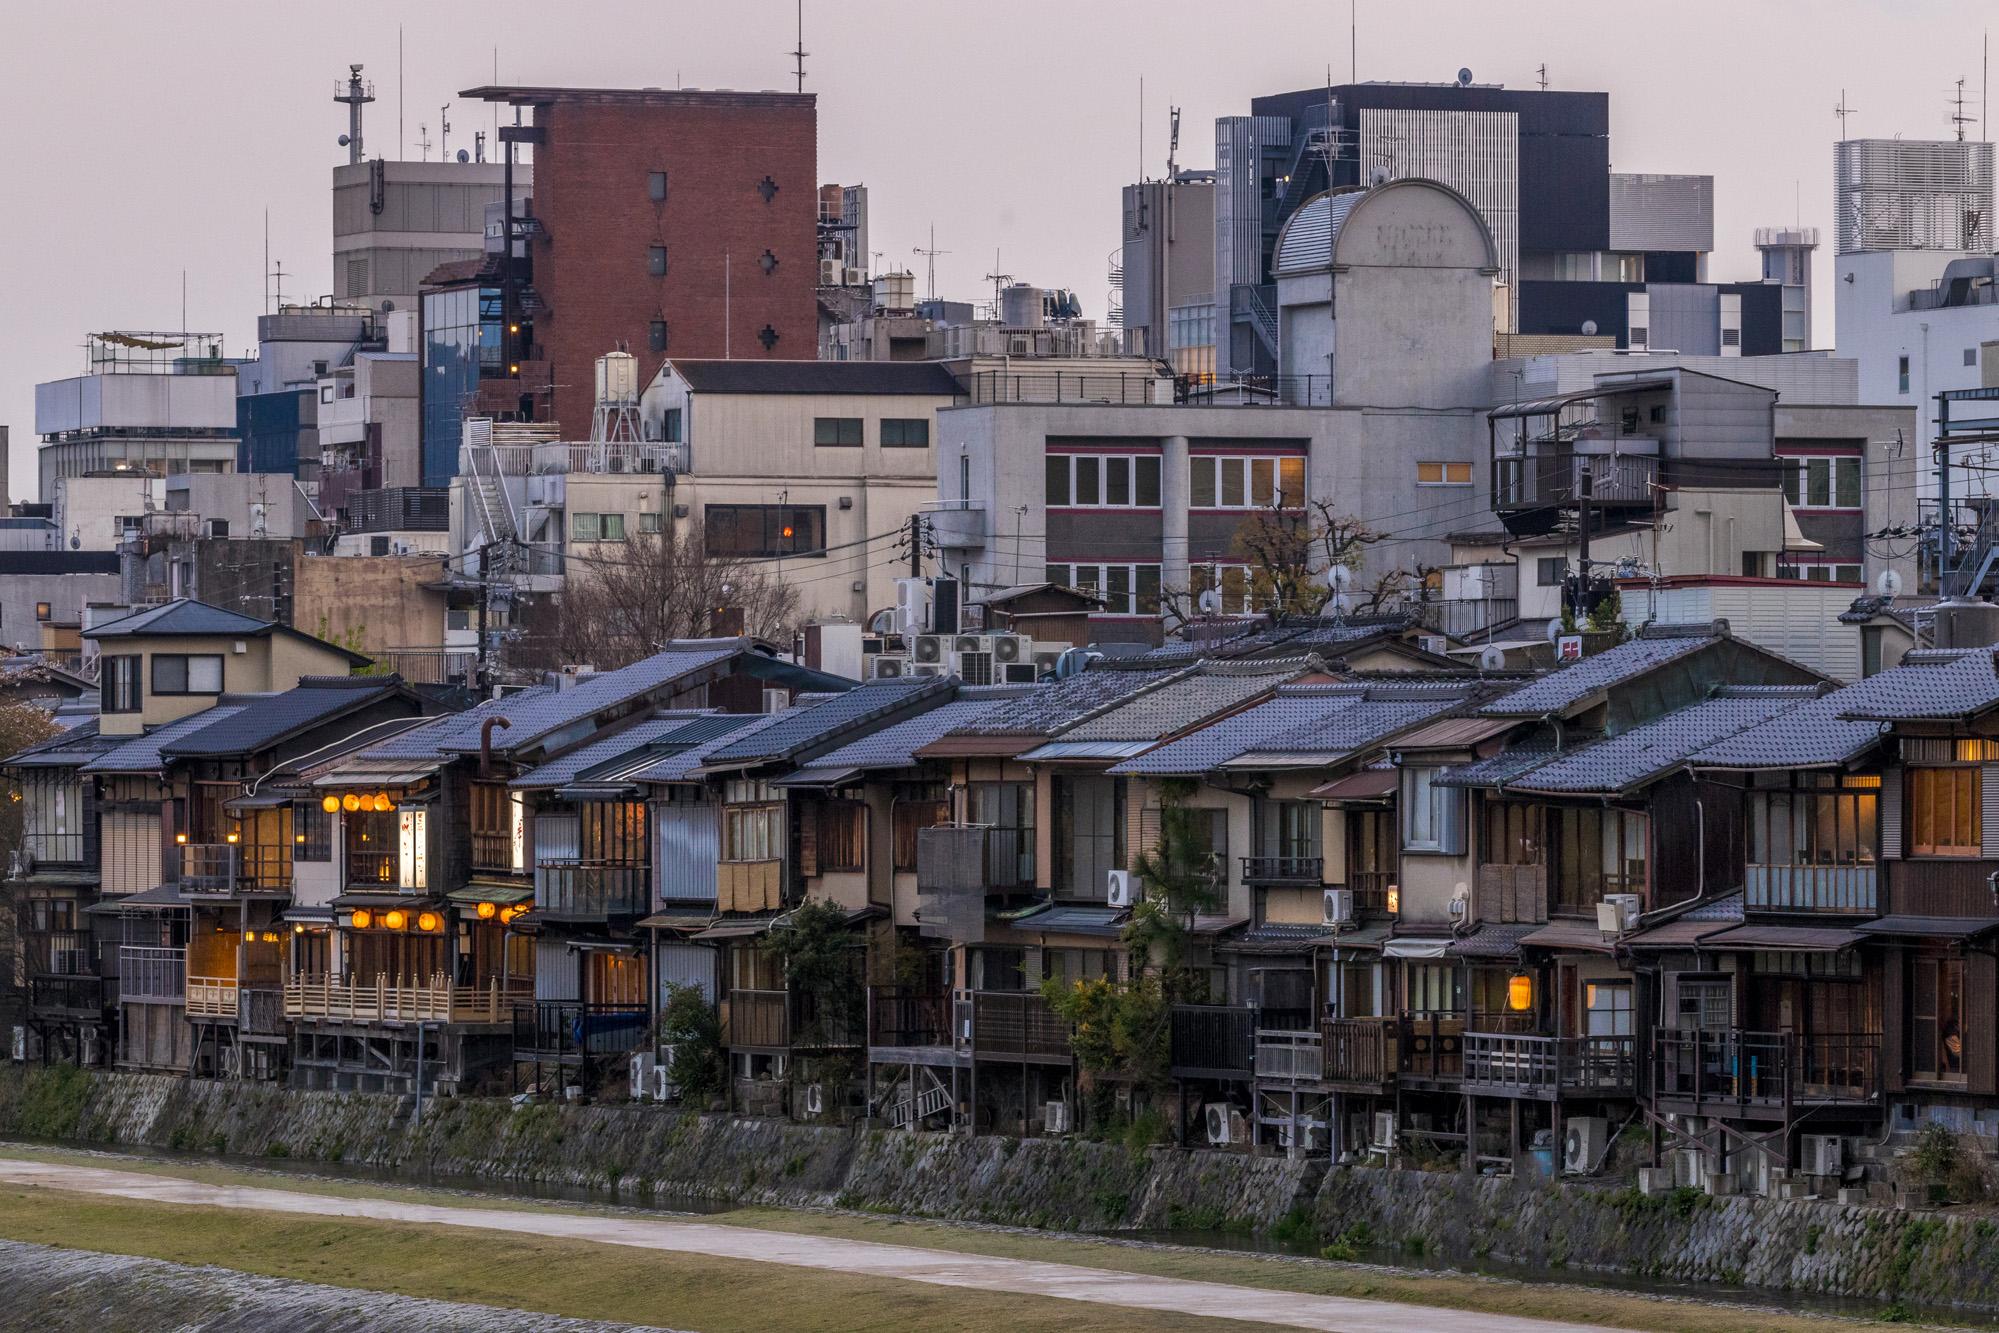 Kamo-gawa dans la ville de Kyōto au Japon